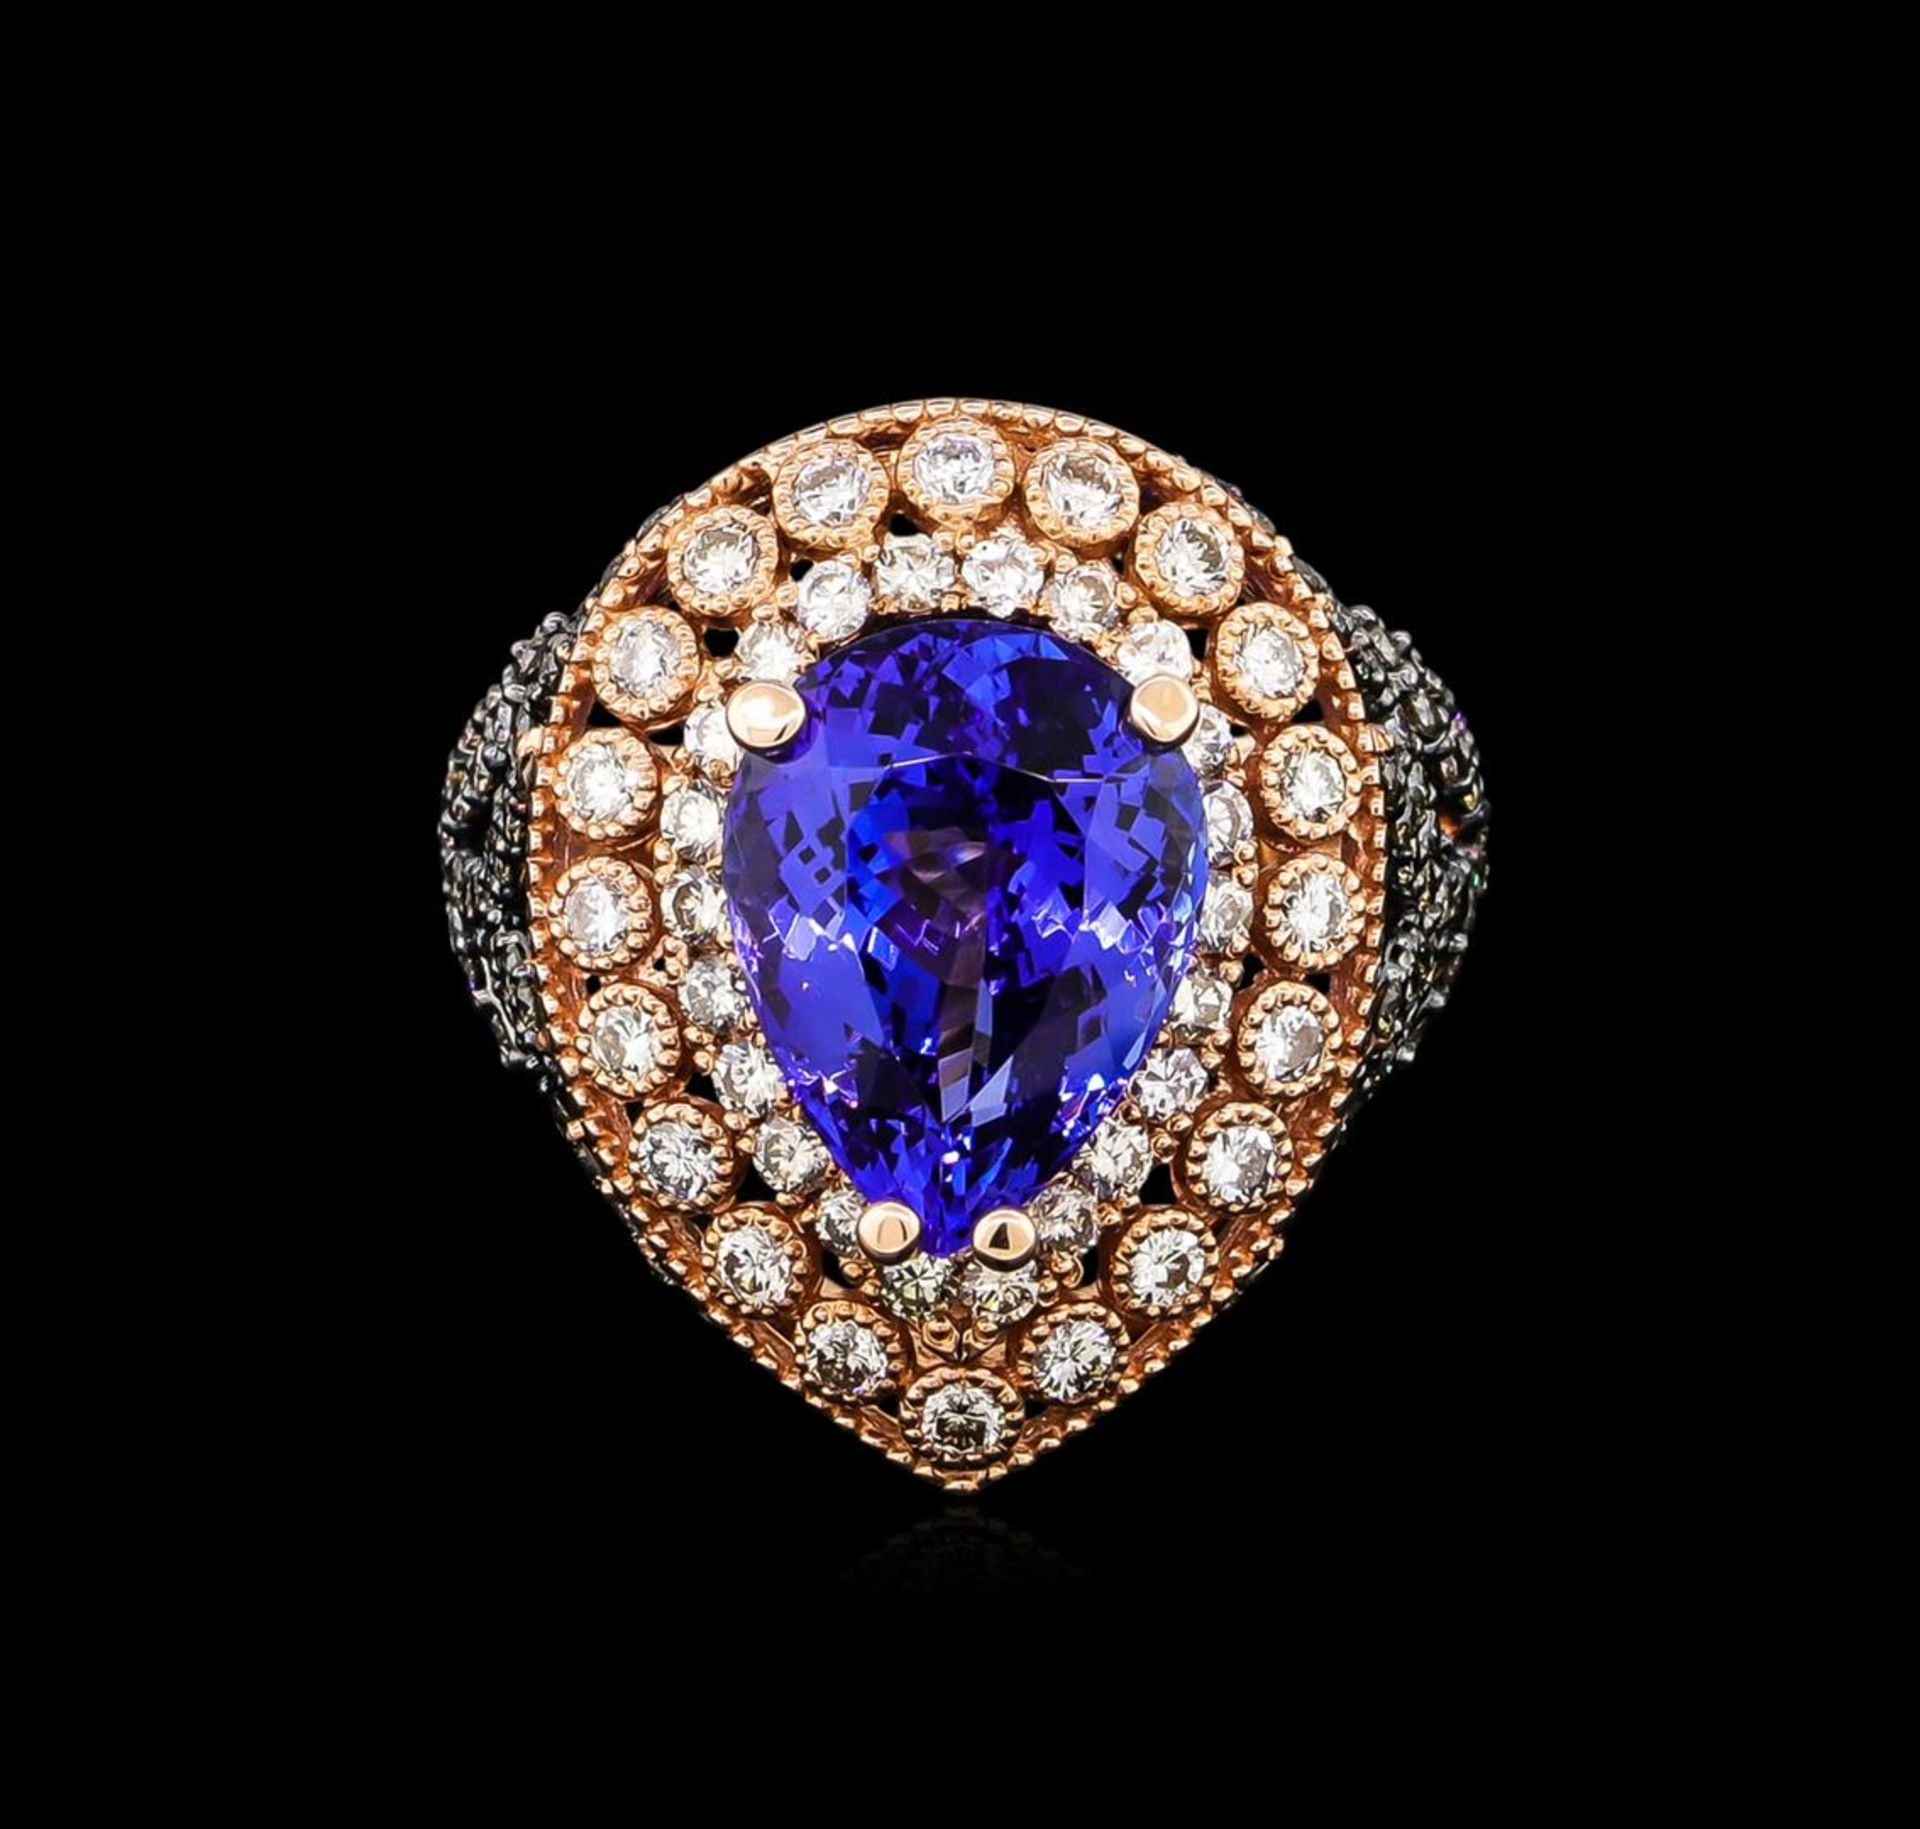 7.31 ctw Tanzanite and Diamond Ring - 14KT Rose Gold - Image 2 of 5